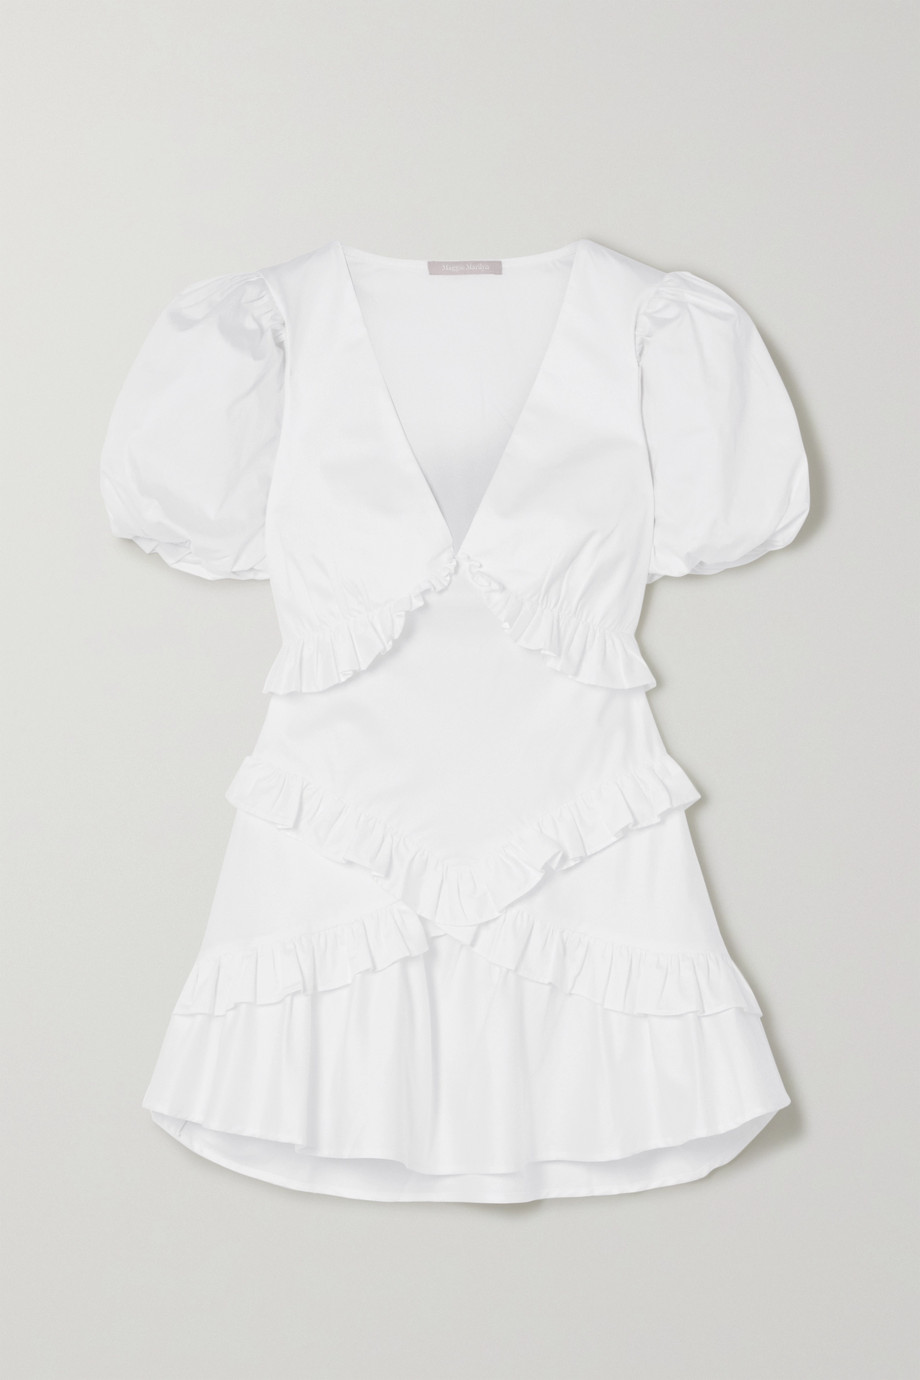 Maggie Marilyn The Jones 2.0 ruffled cotton-poplin mini dress